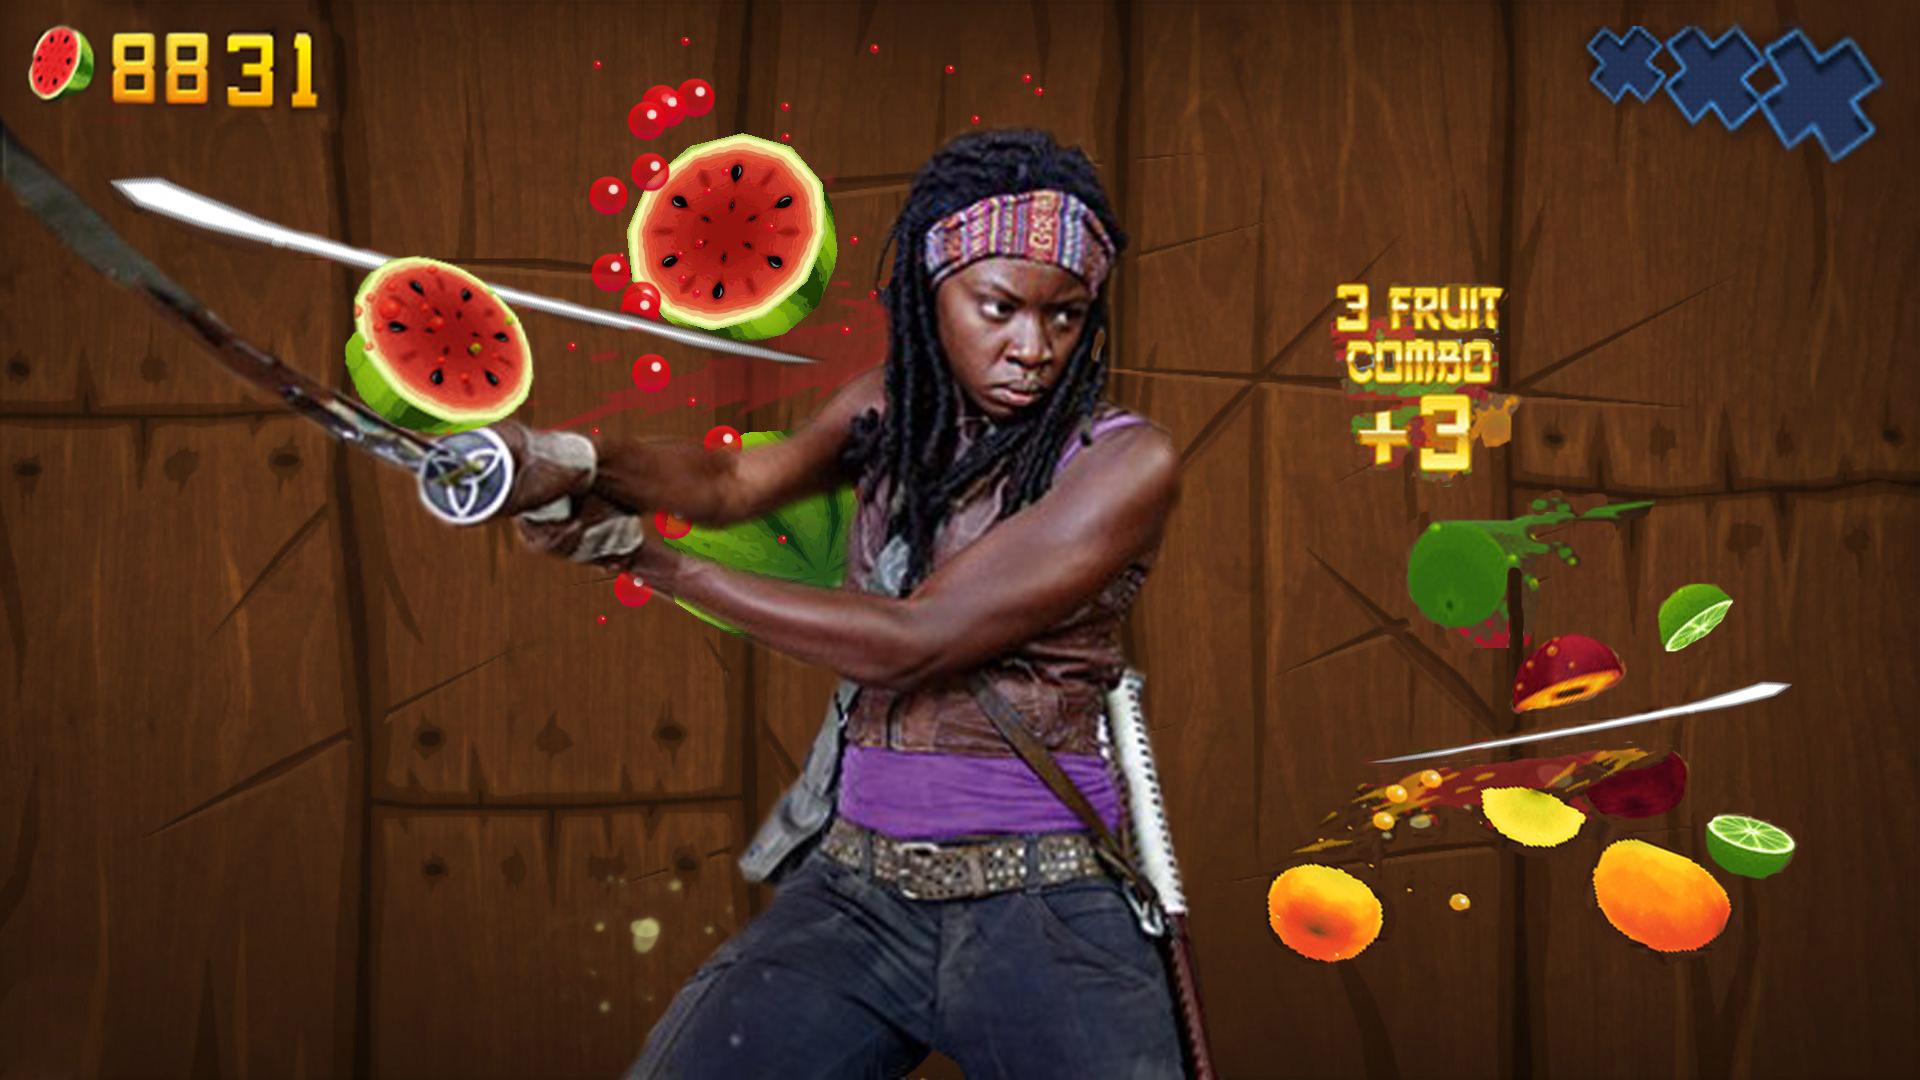 Fruit Ninja: Walking Dead Mode. What Michonne playing Fruit Ninja would look like... No wonder she always has a face like that. Imagine what goes through her head when she cuts those watamelans.